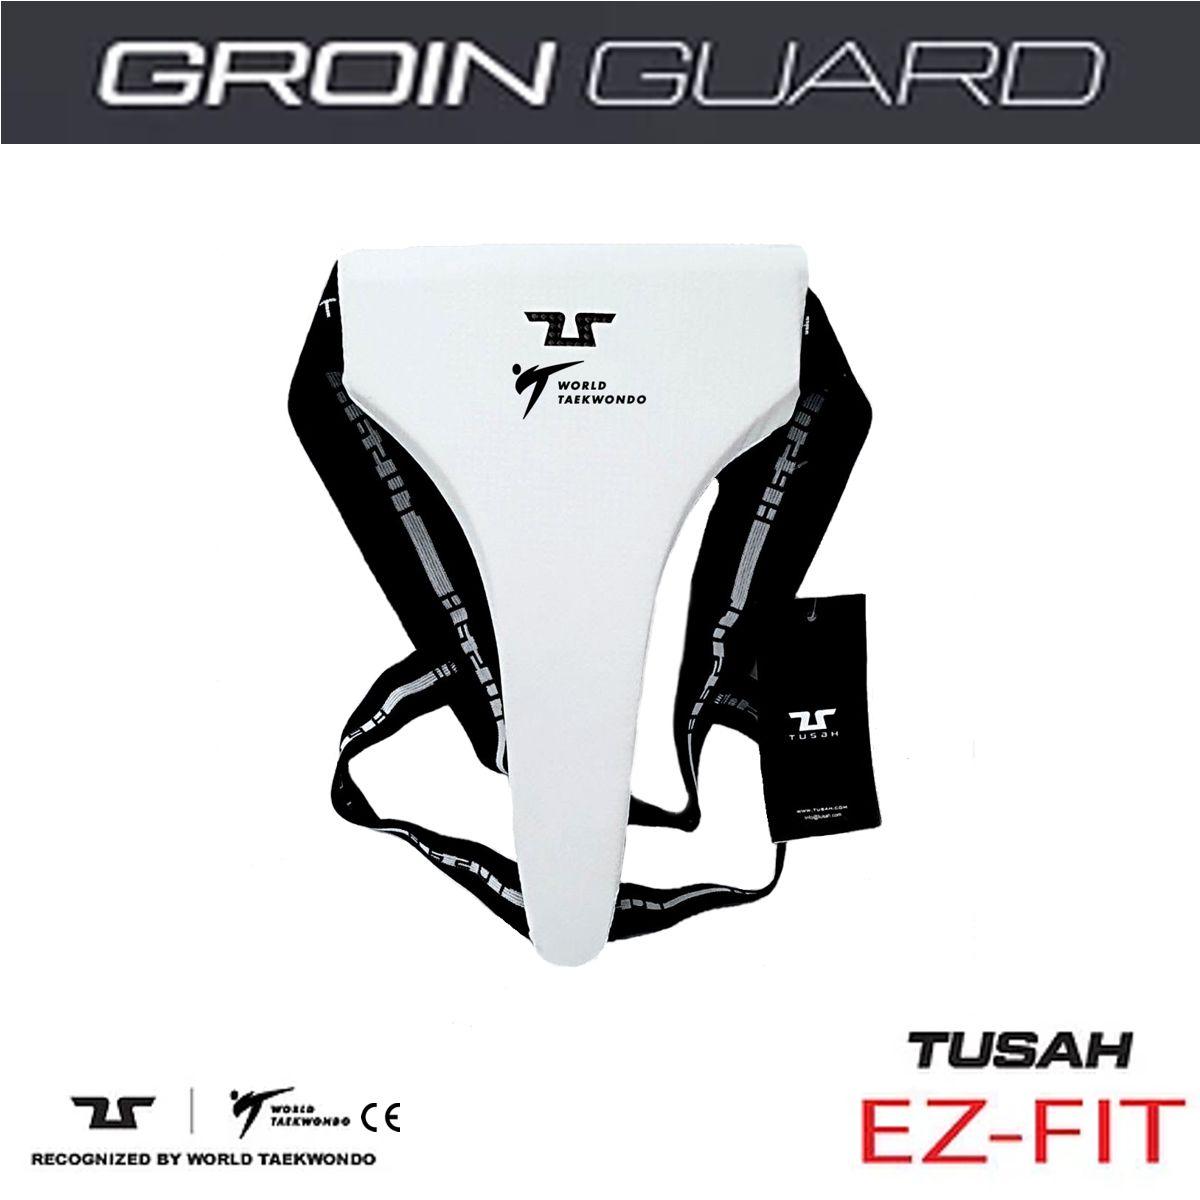 Protective Equipment - Tusah Europe